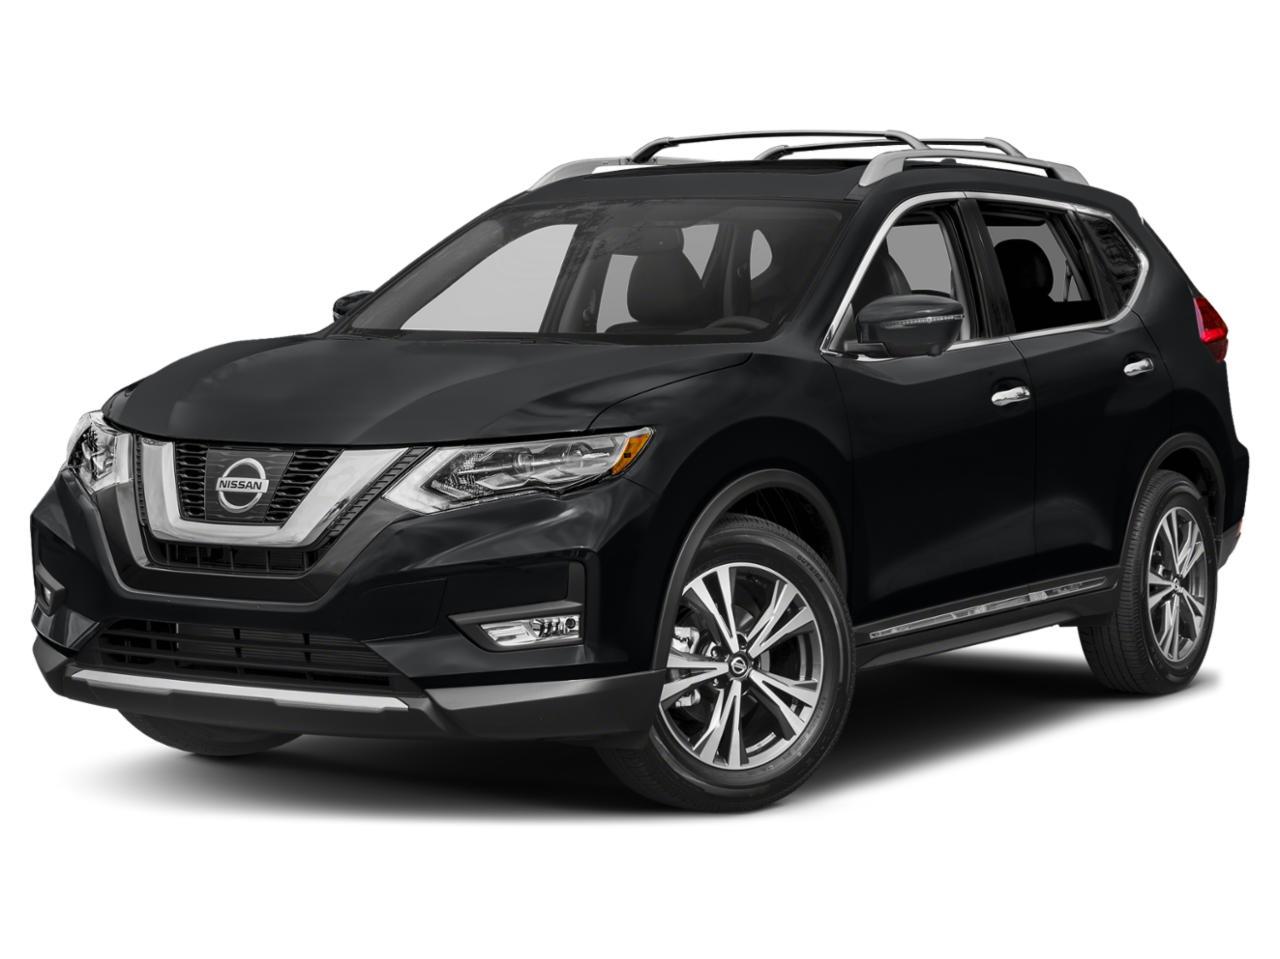 2018 Nissan Rogue Vehicle Photo in GAINESVILLE, FL 32609-3647